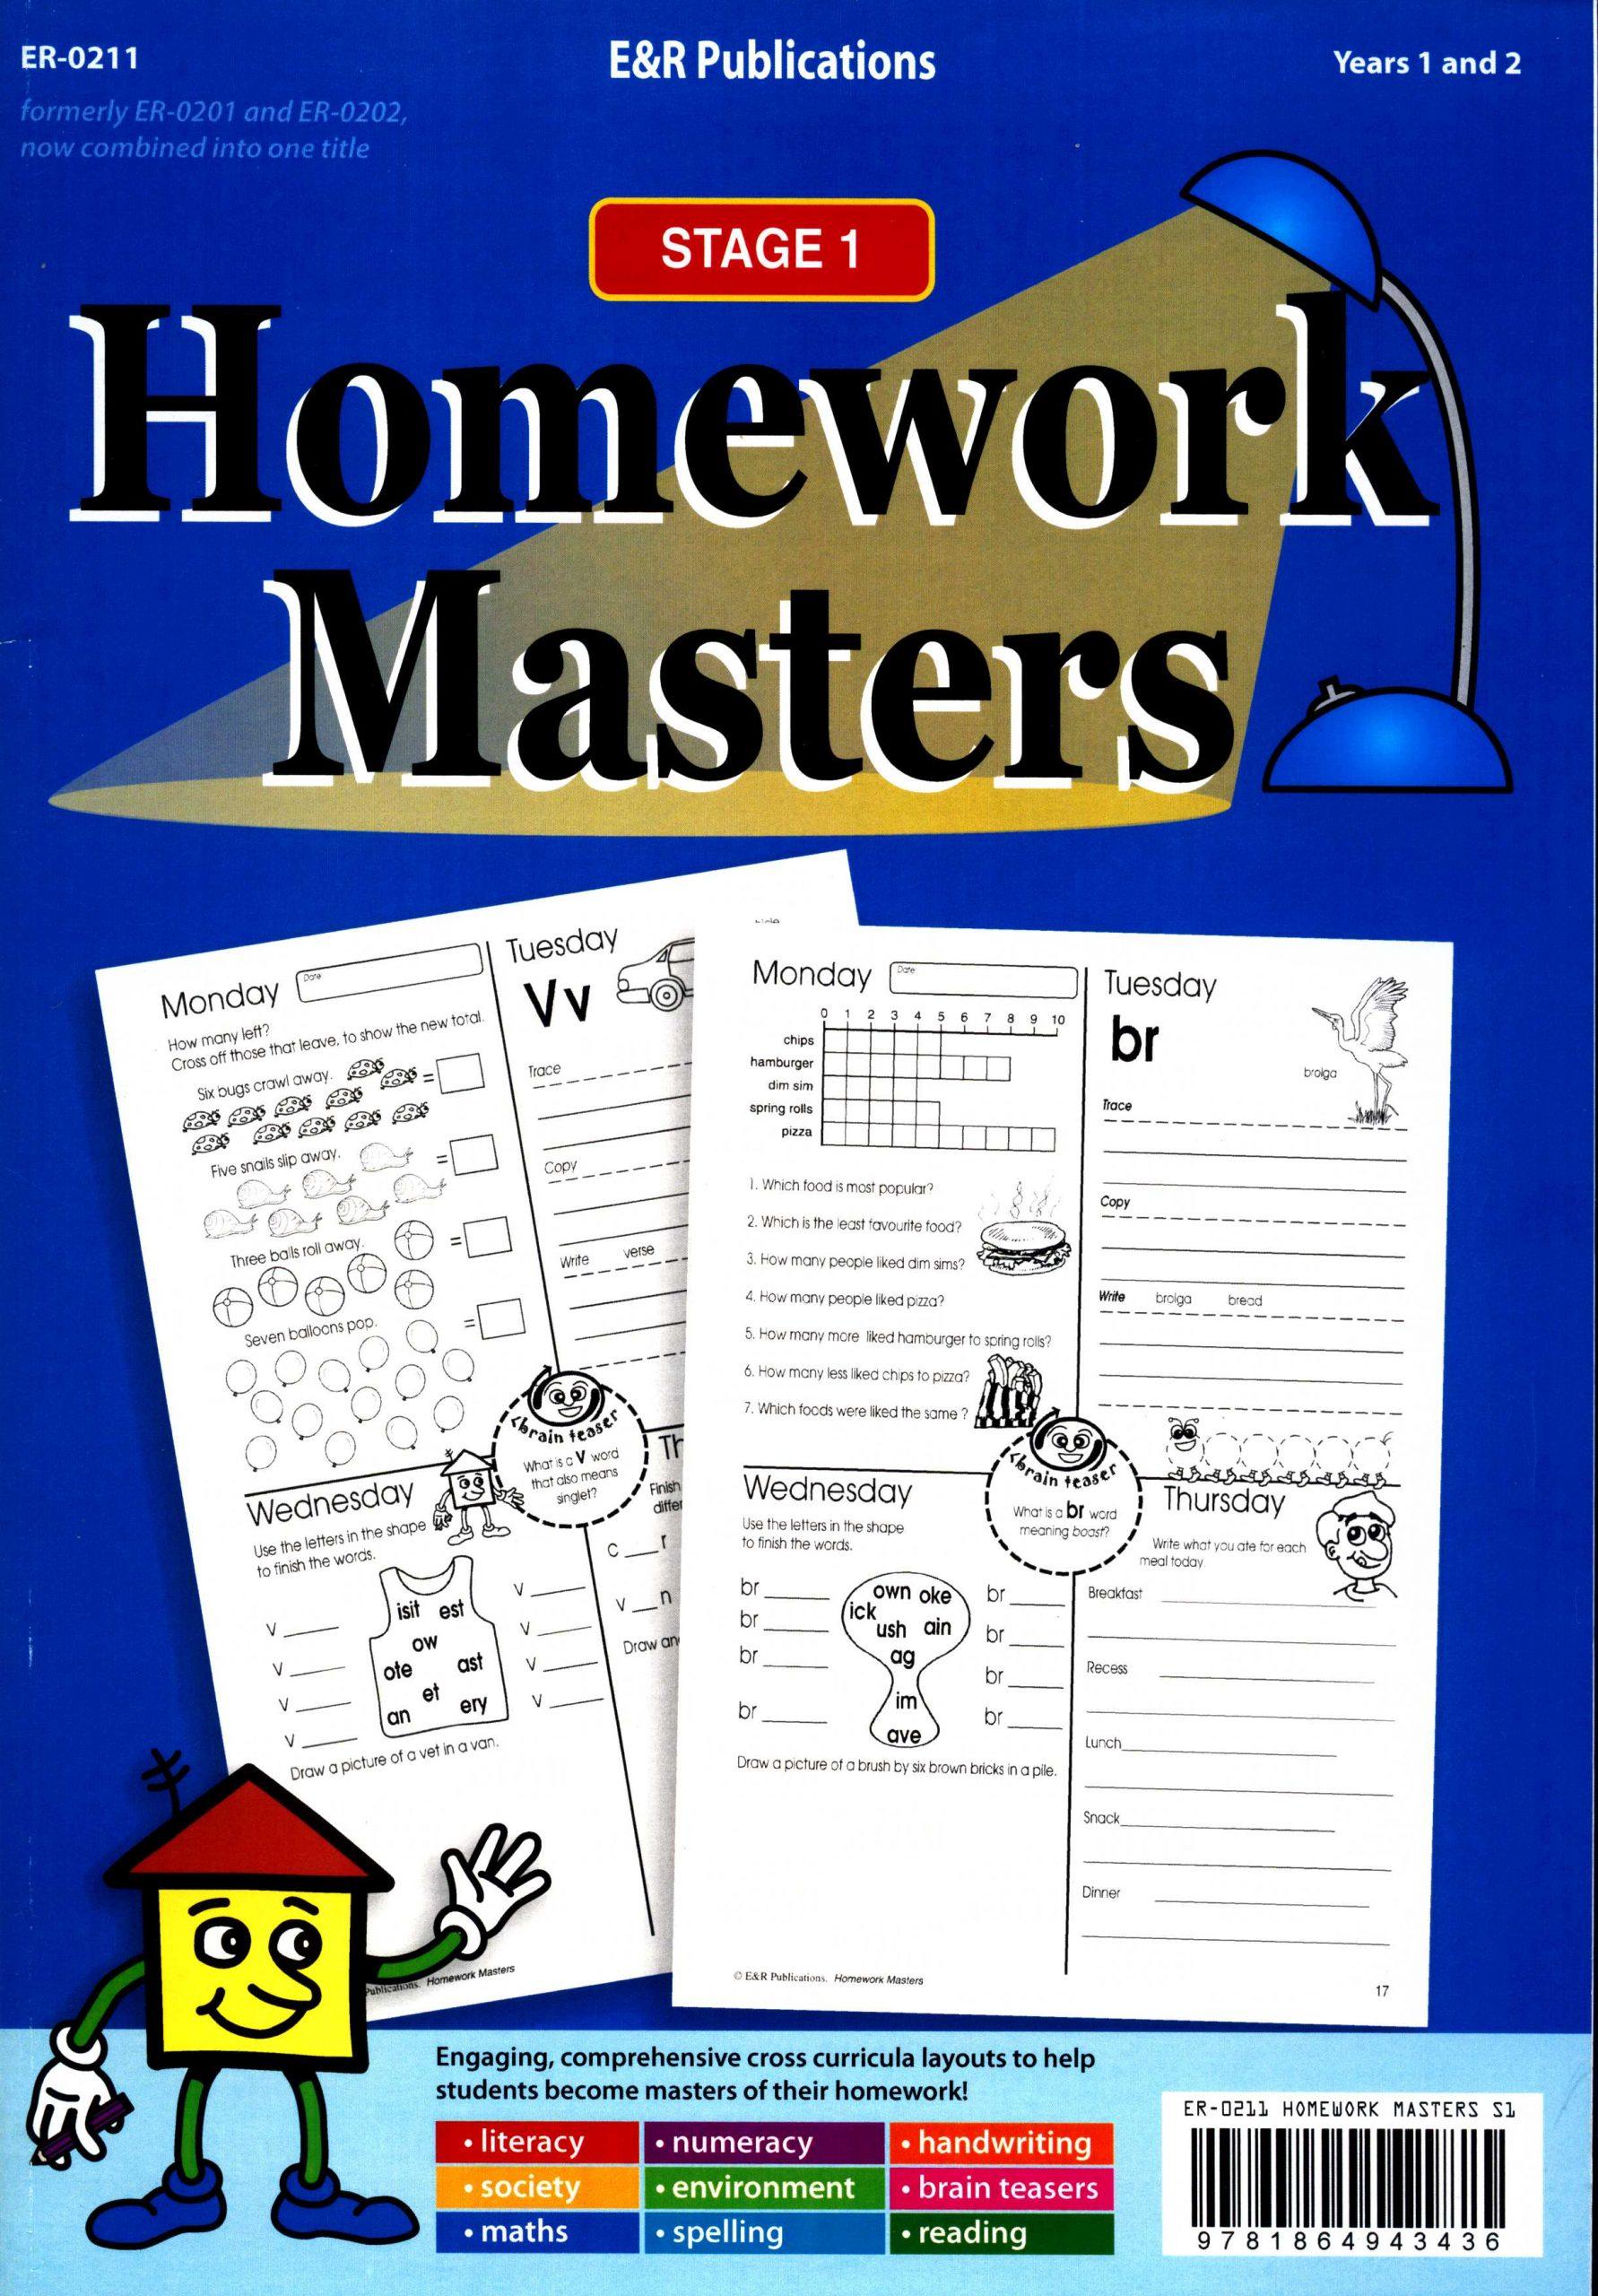 Homework Masters Stage 1 Years 1 2